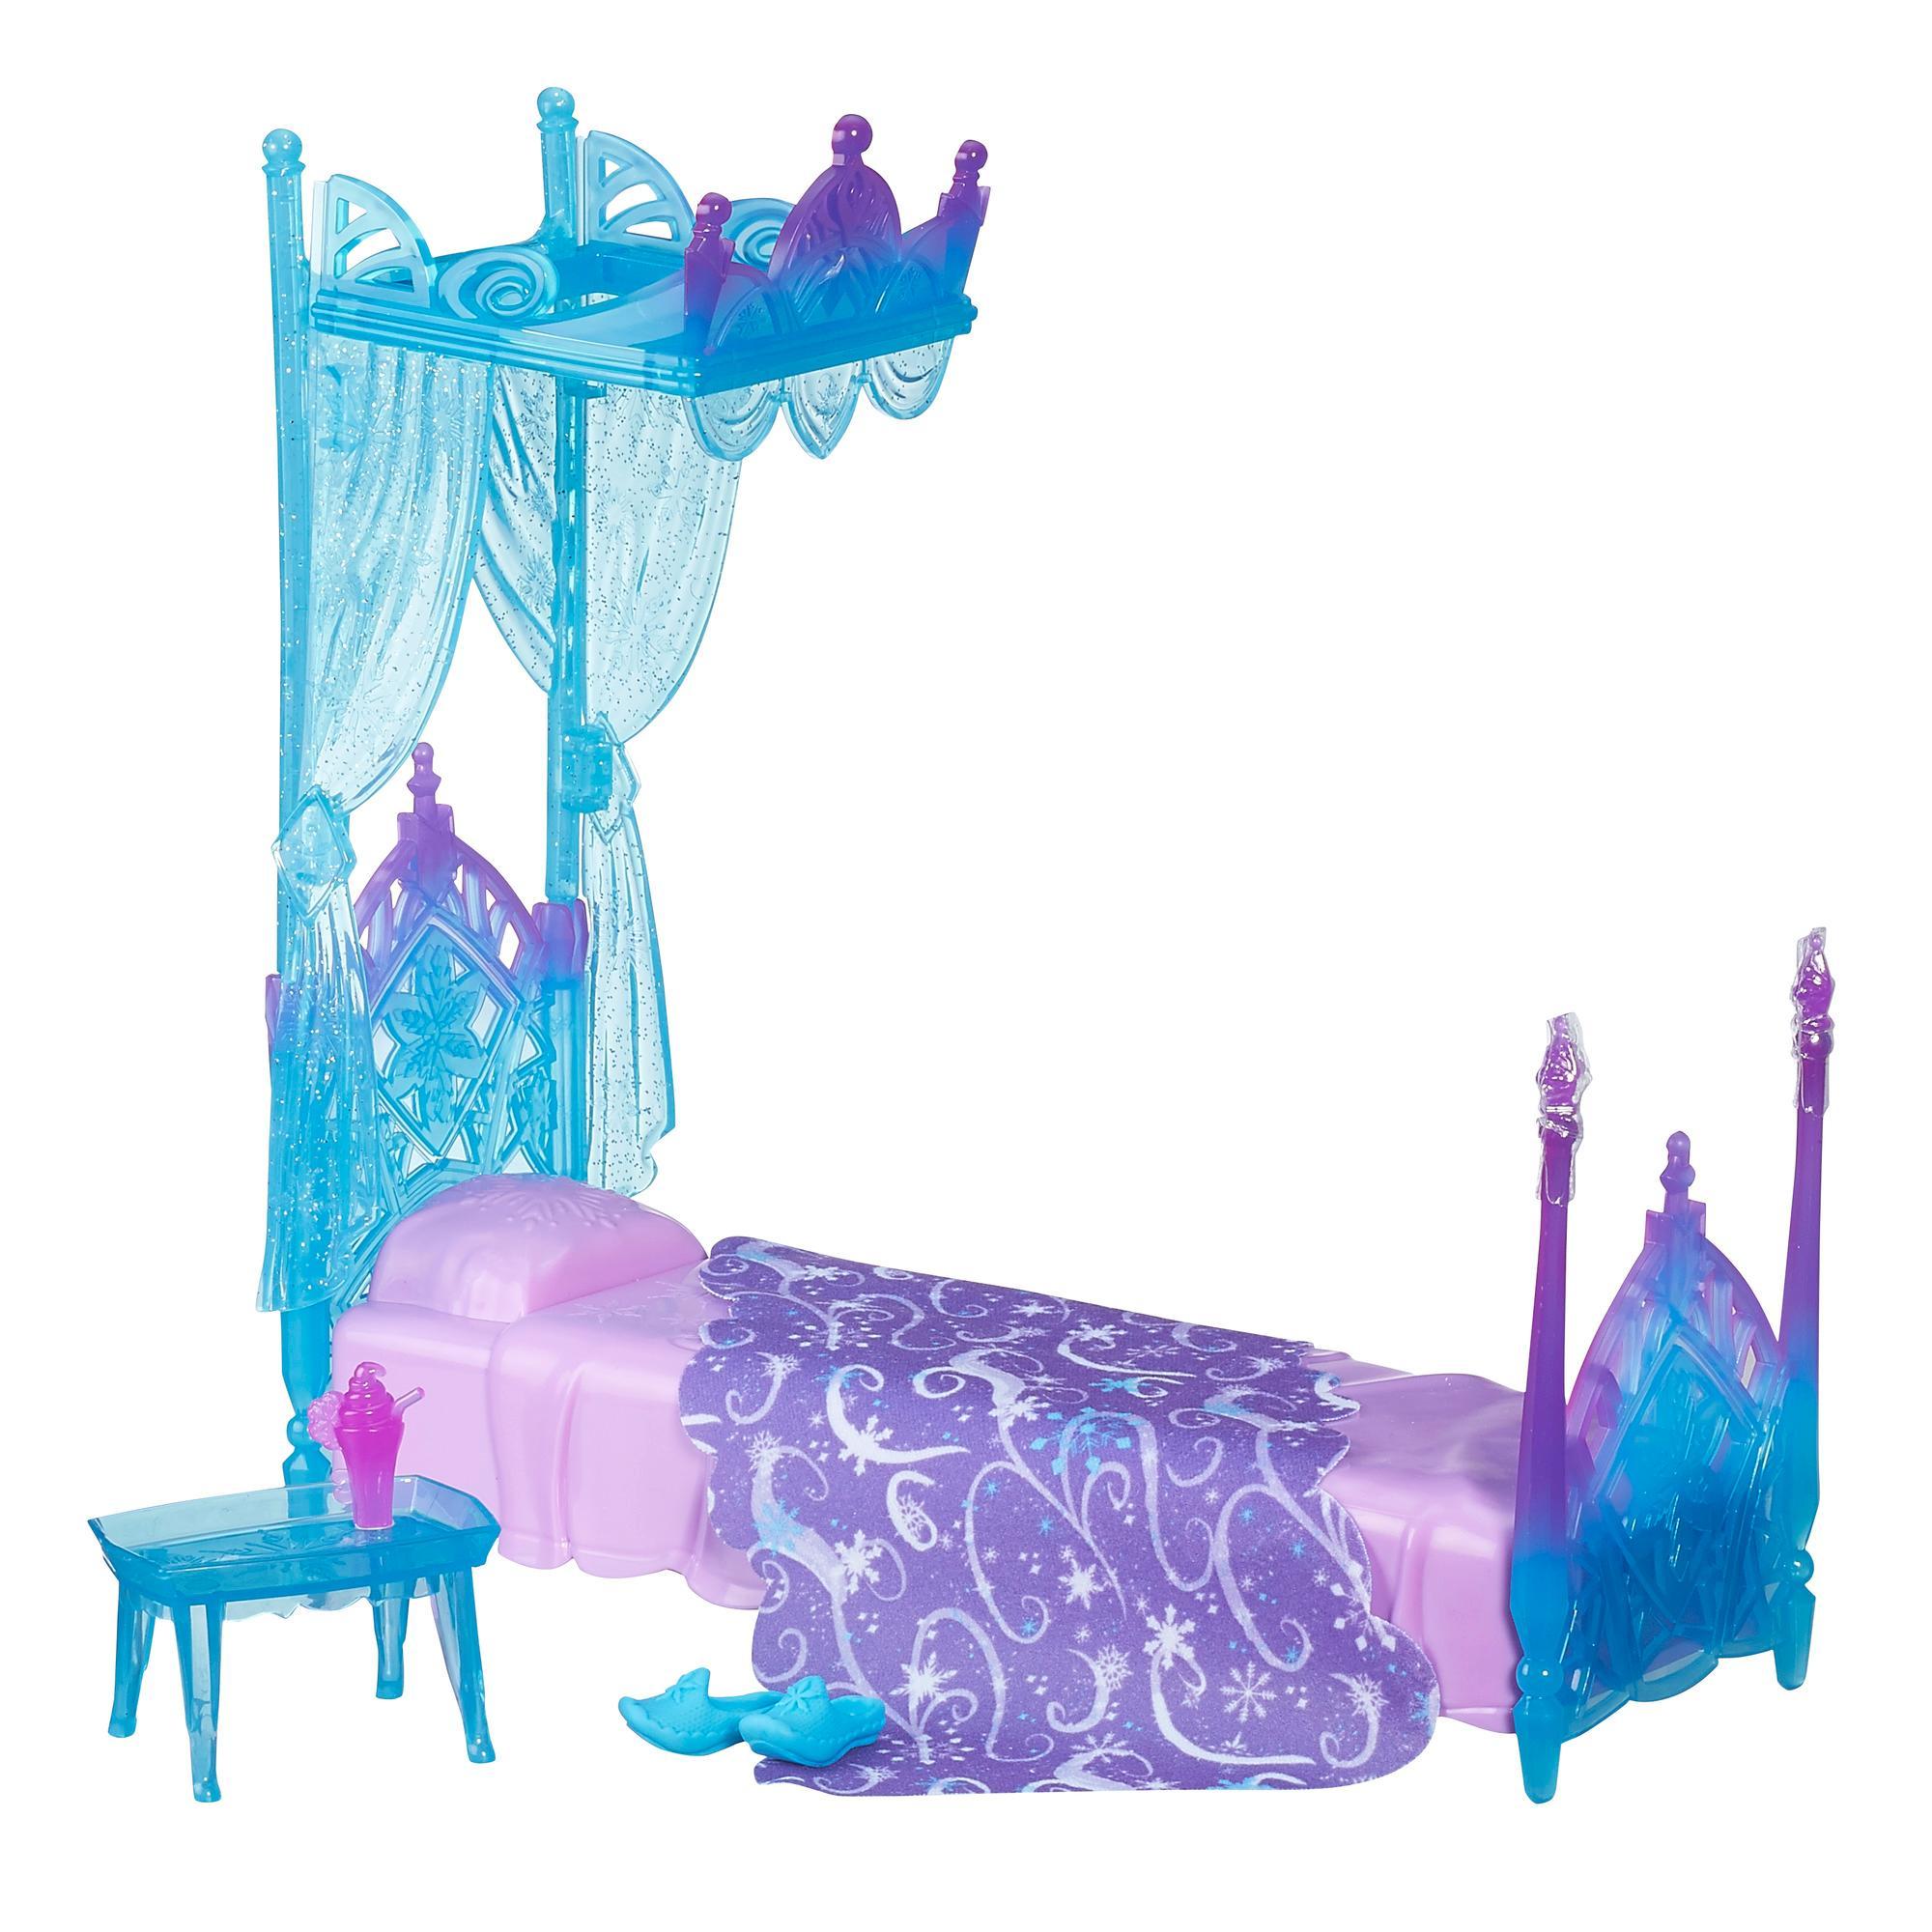 Cenário Luxo Frozen Penteadeira da Elsa